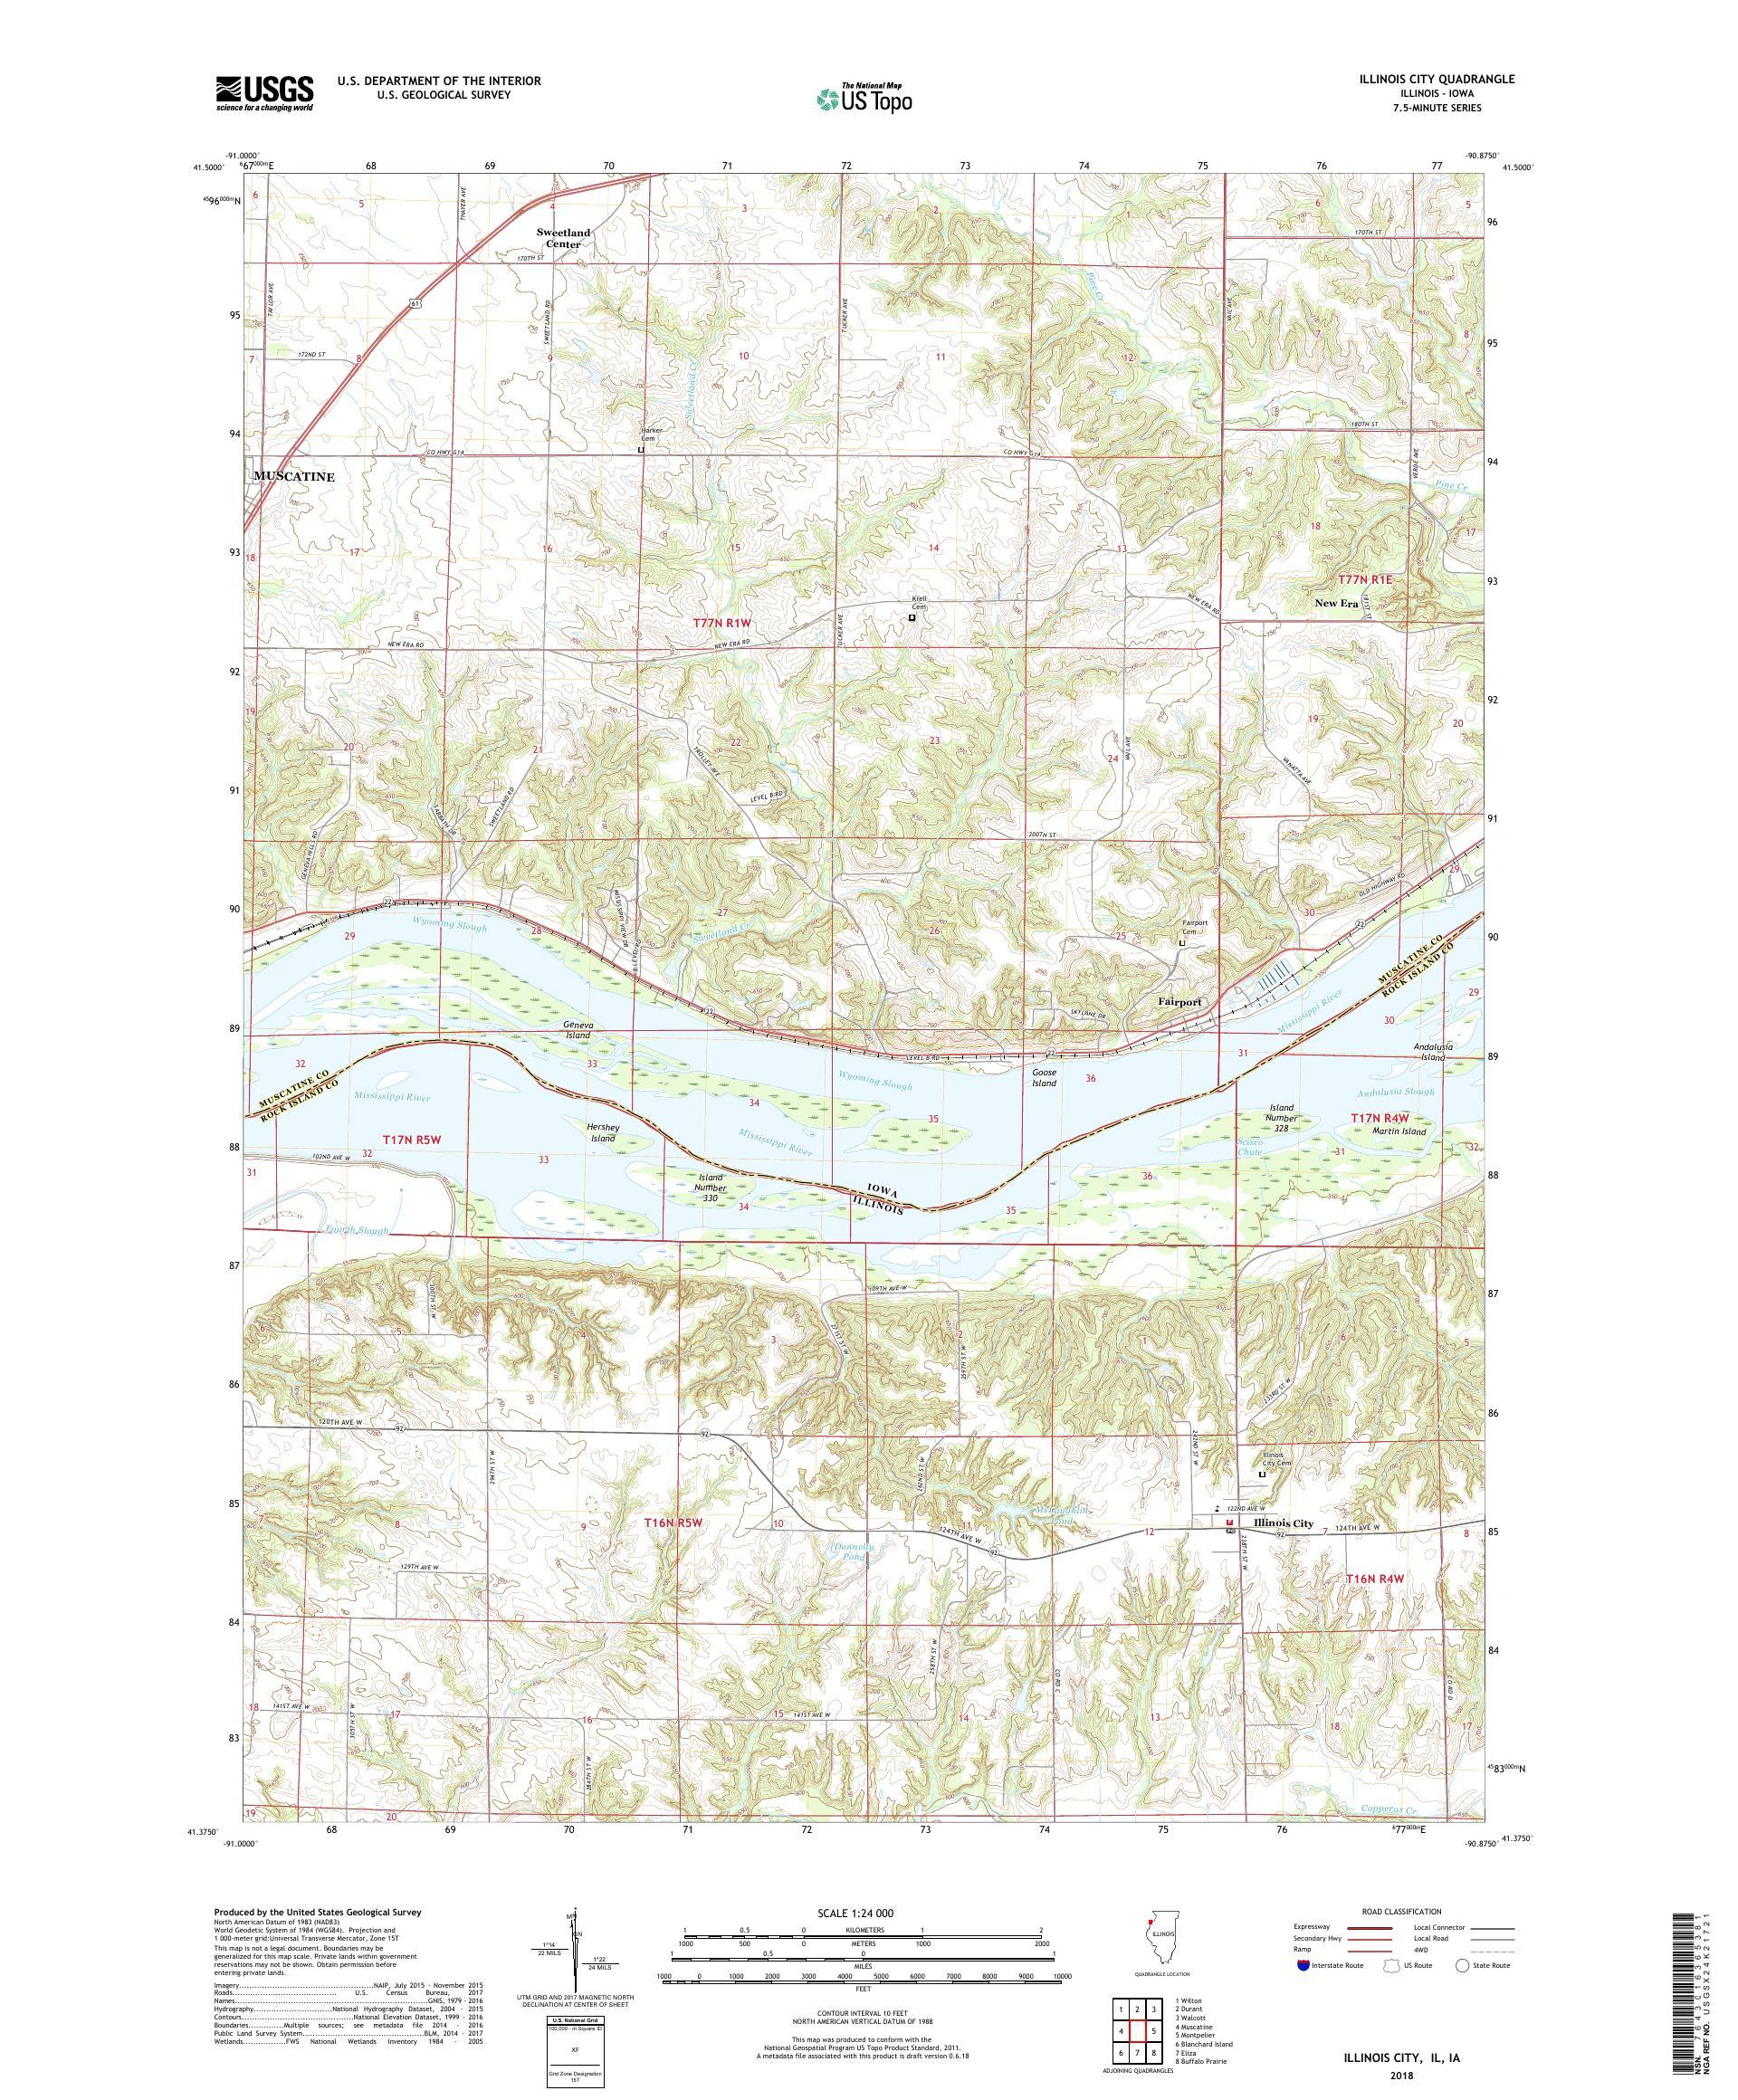 MyTopo Illinois City, Illinois USGS Quad Topo Map on map illinois counties, map illinois airports, map richmond va, map illinois roads, map of northern illinois, map in europe, map illinois highways, map anthem az, map illinois zip codes, map illinois country, map lahore city, map illinois parks, map illinois suburbs, map illinois rivers, map illinois railroads, map illinois state, map baltimore md, map detroit mi, map cincinnati ohio, map wichita ks,